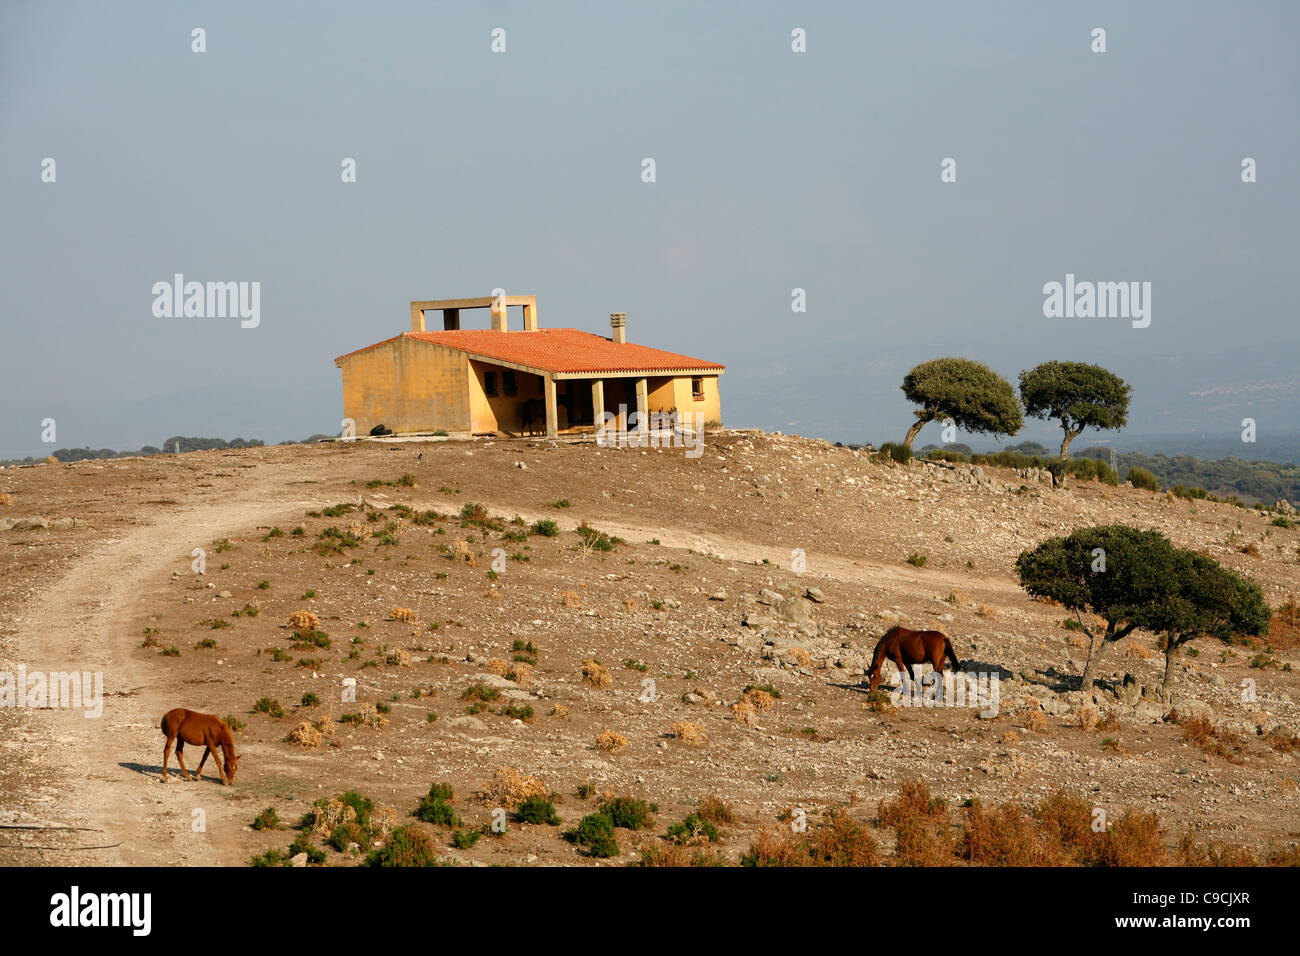 Landscape around Monti Ferru, Sardinia, Italy. - Stock Image